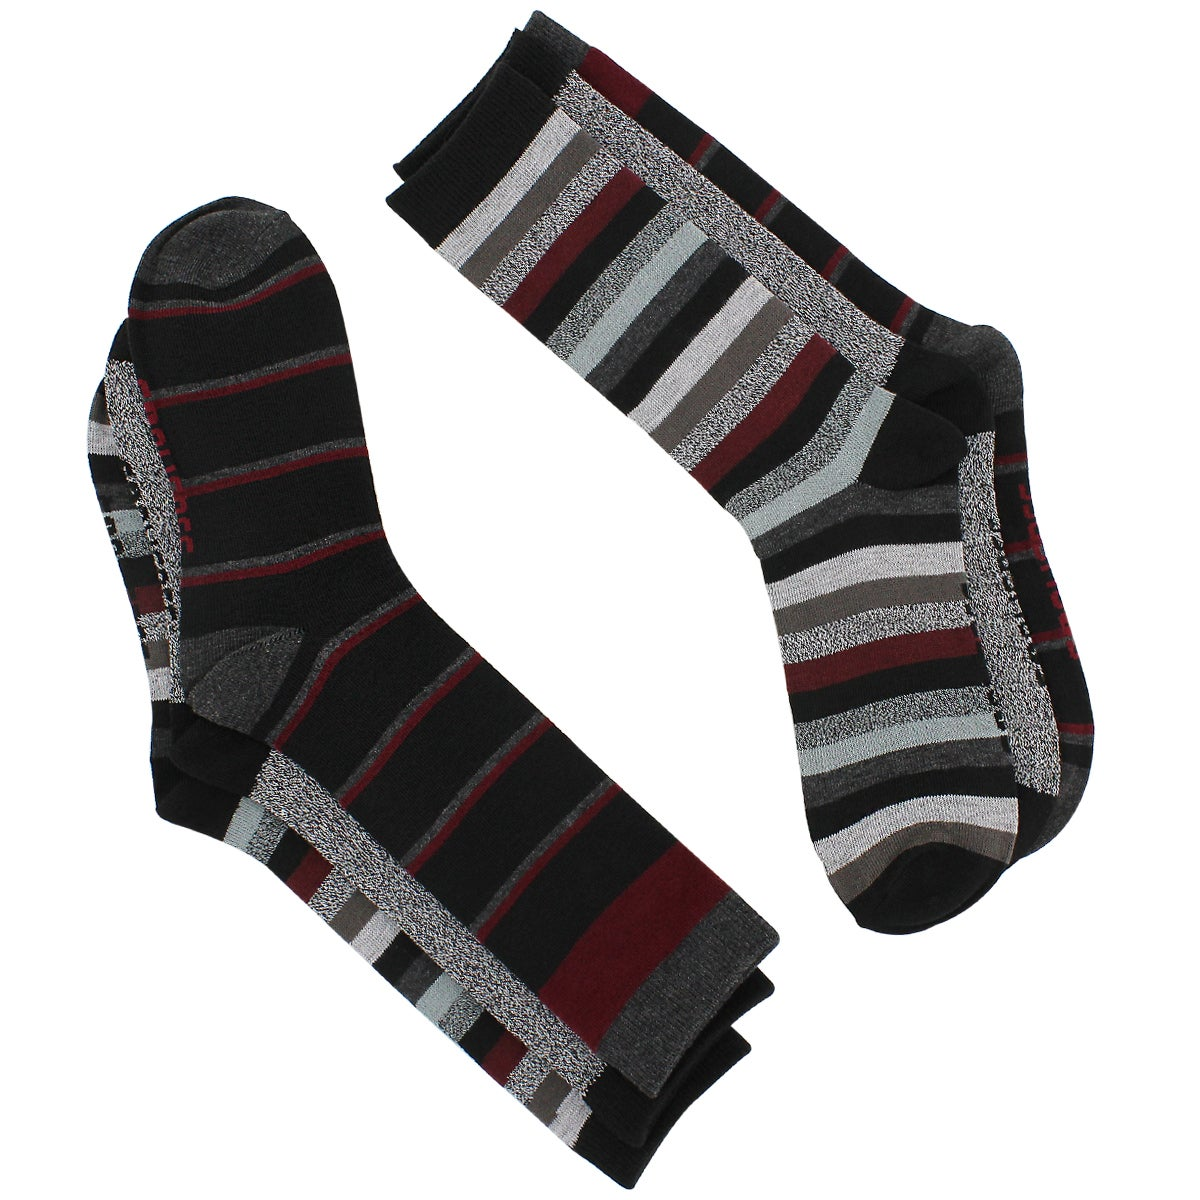 Lds Converse multi offair striped sock